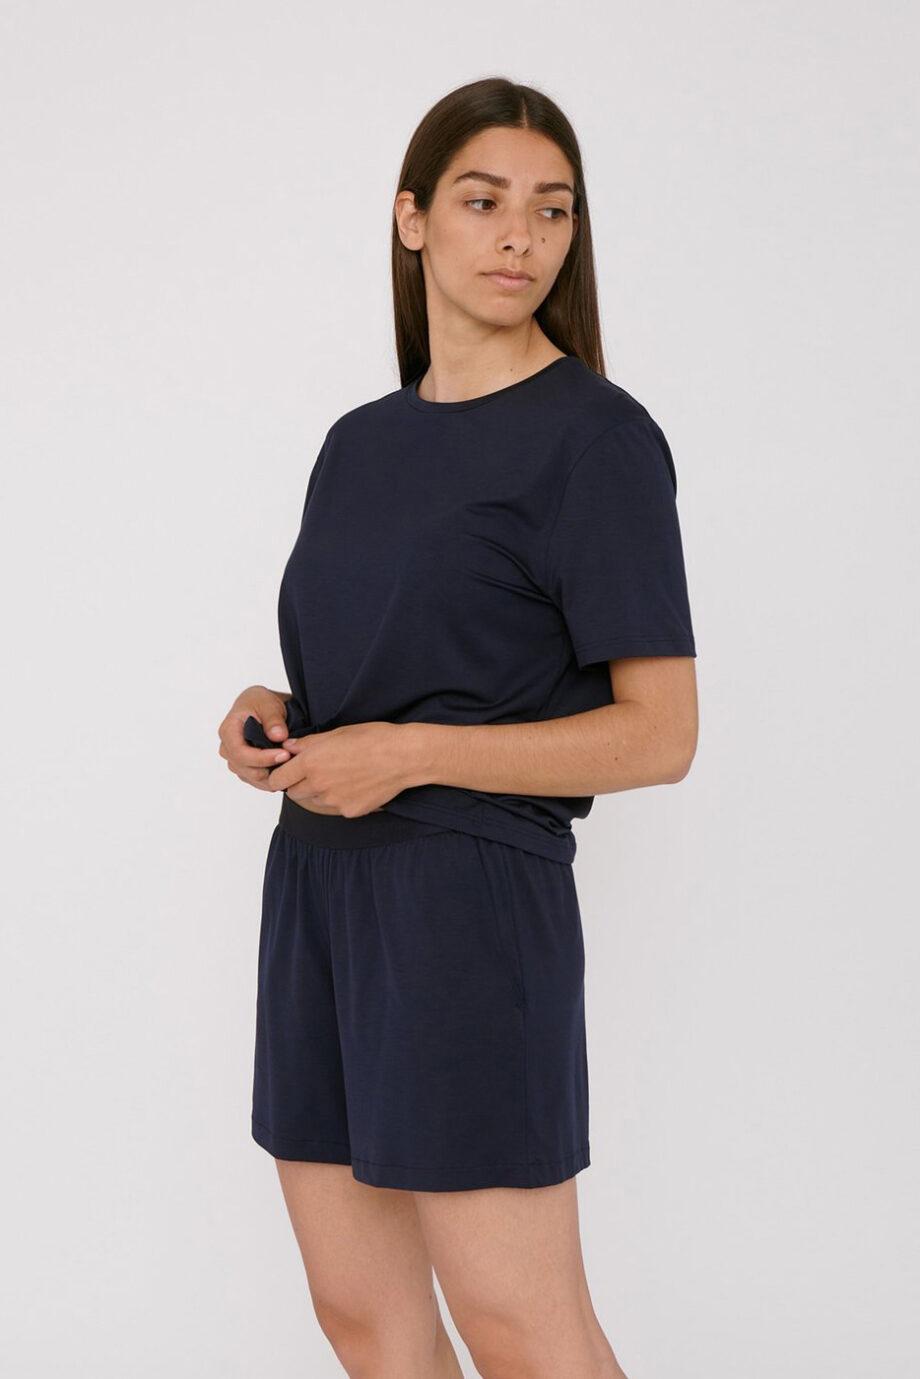 Organic Basics - shorts – navy_front